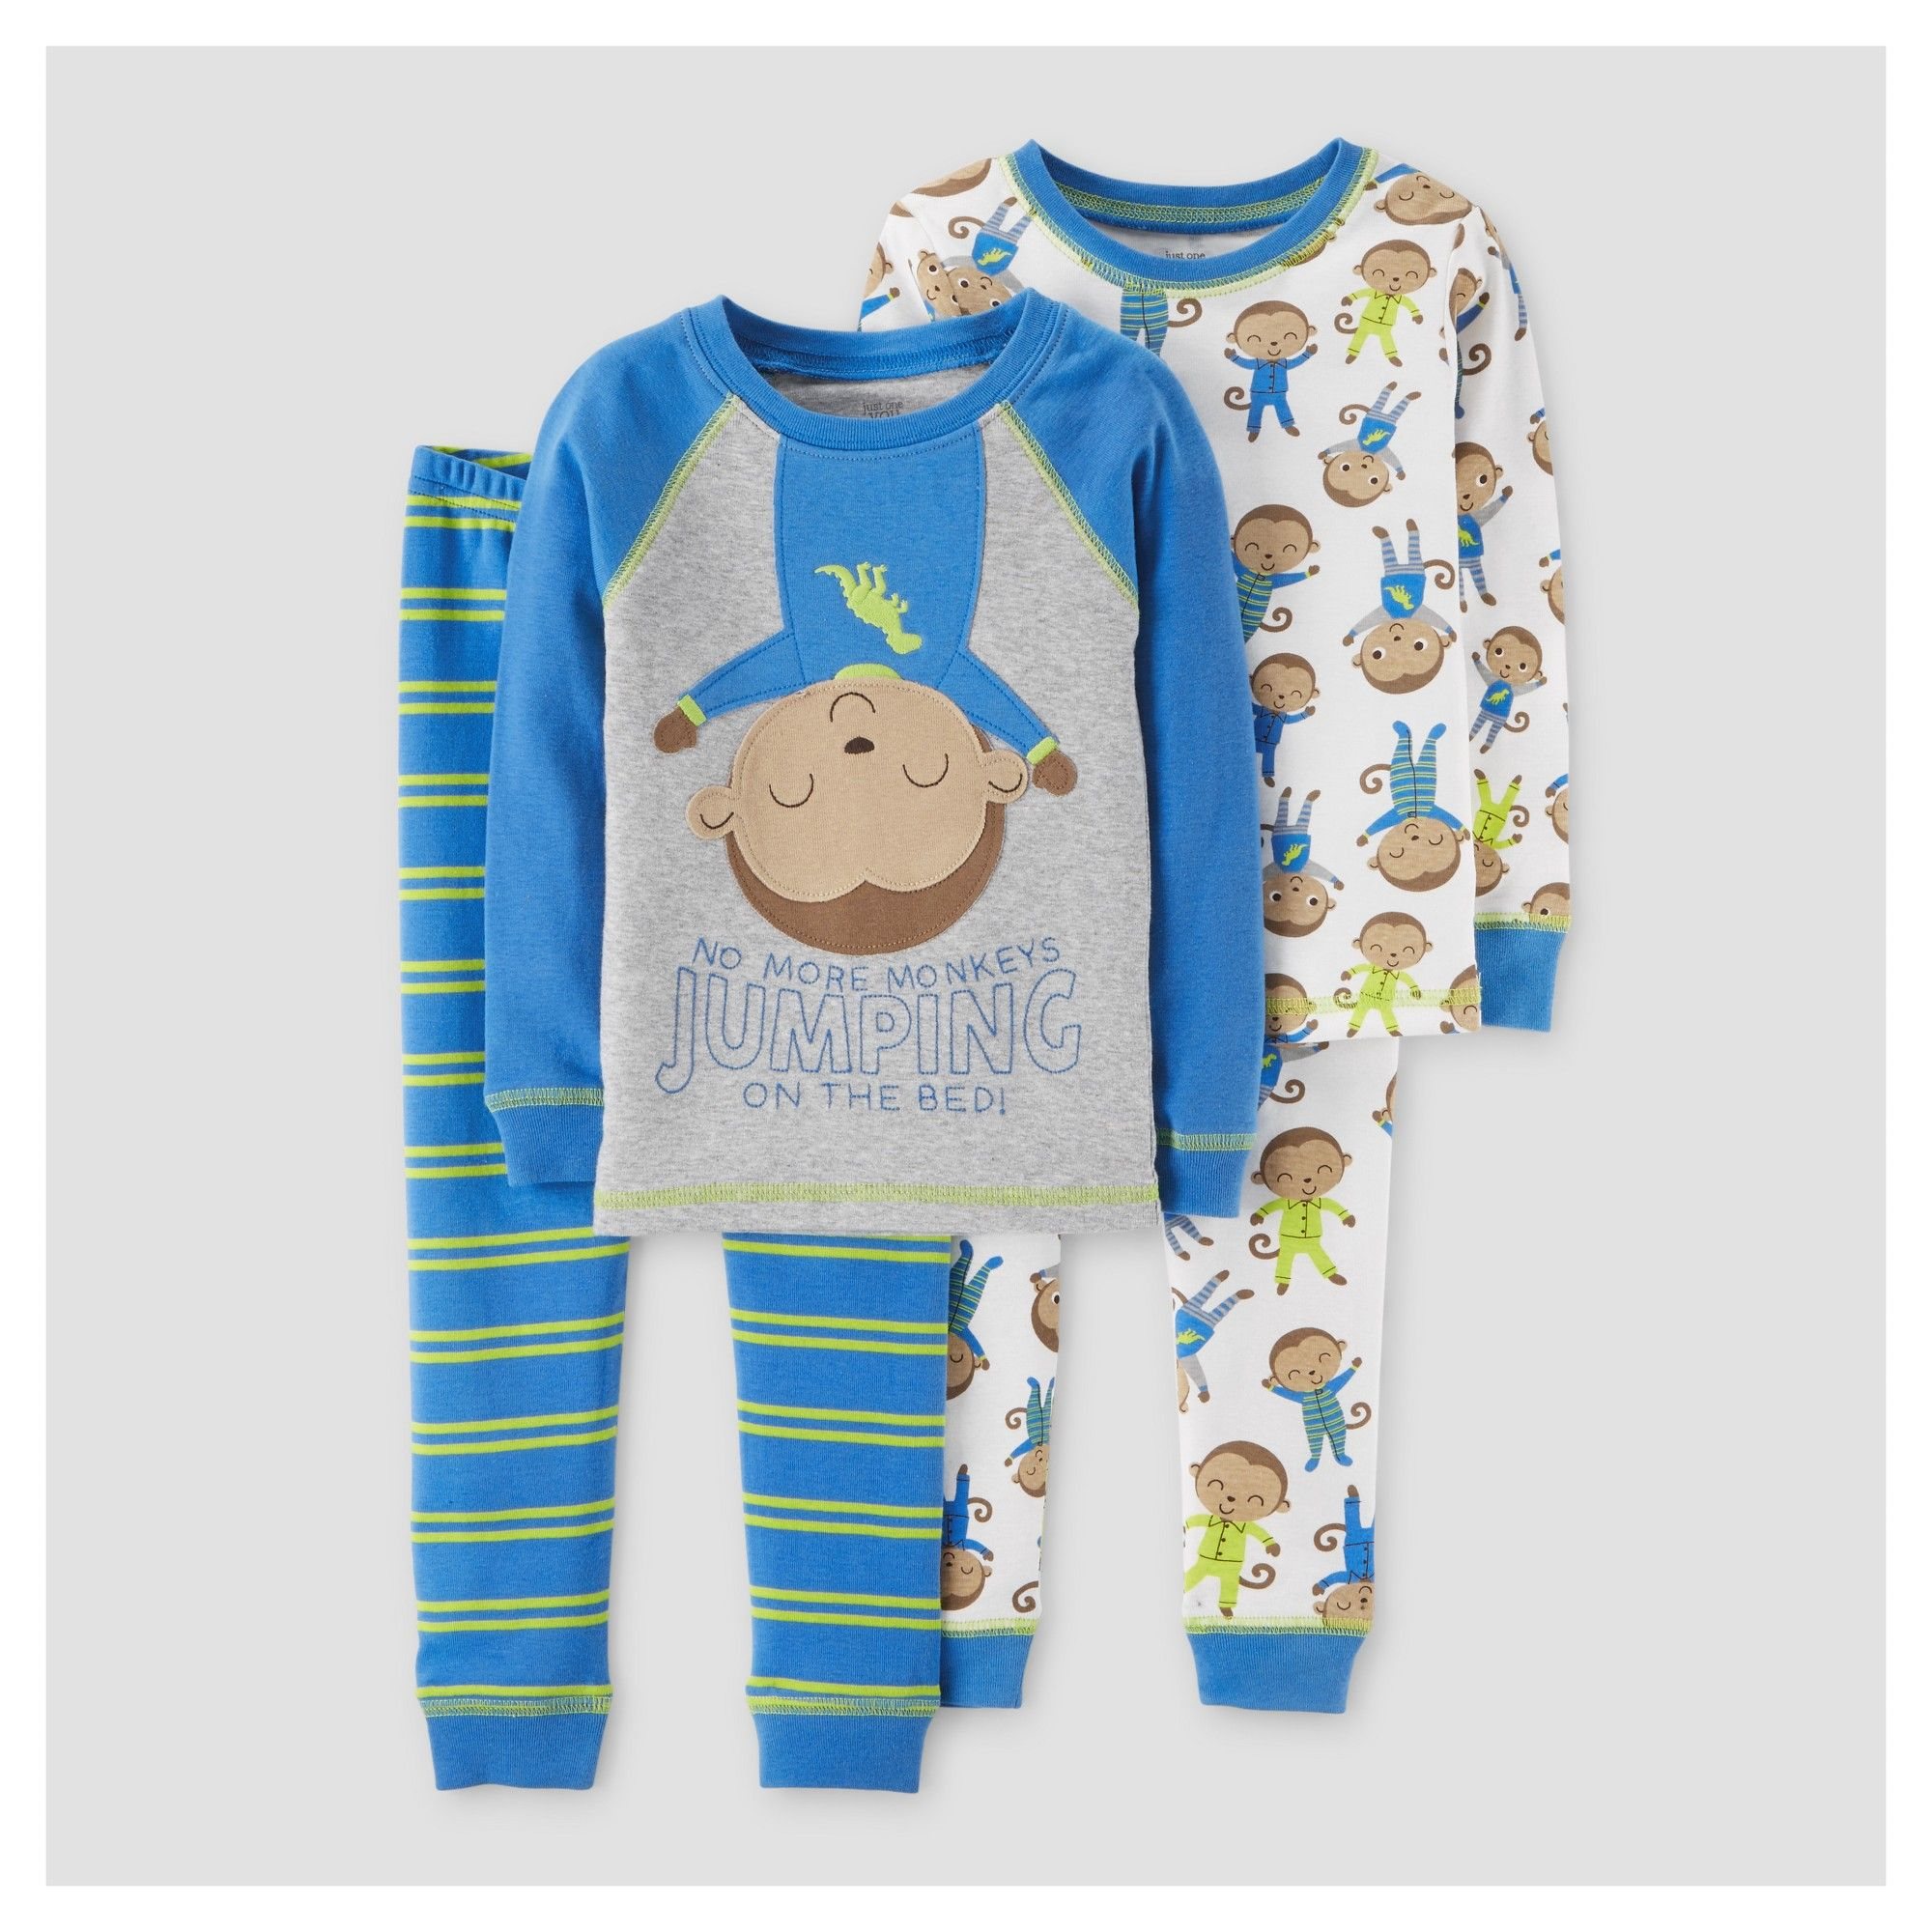 bc44aab4eab0 Baby Boys  4pc Superhero Monkey Long Sleeve Cotton Pajama Set - Just ...